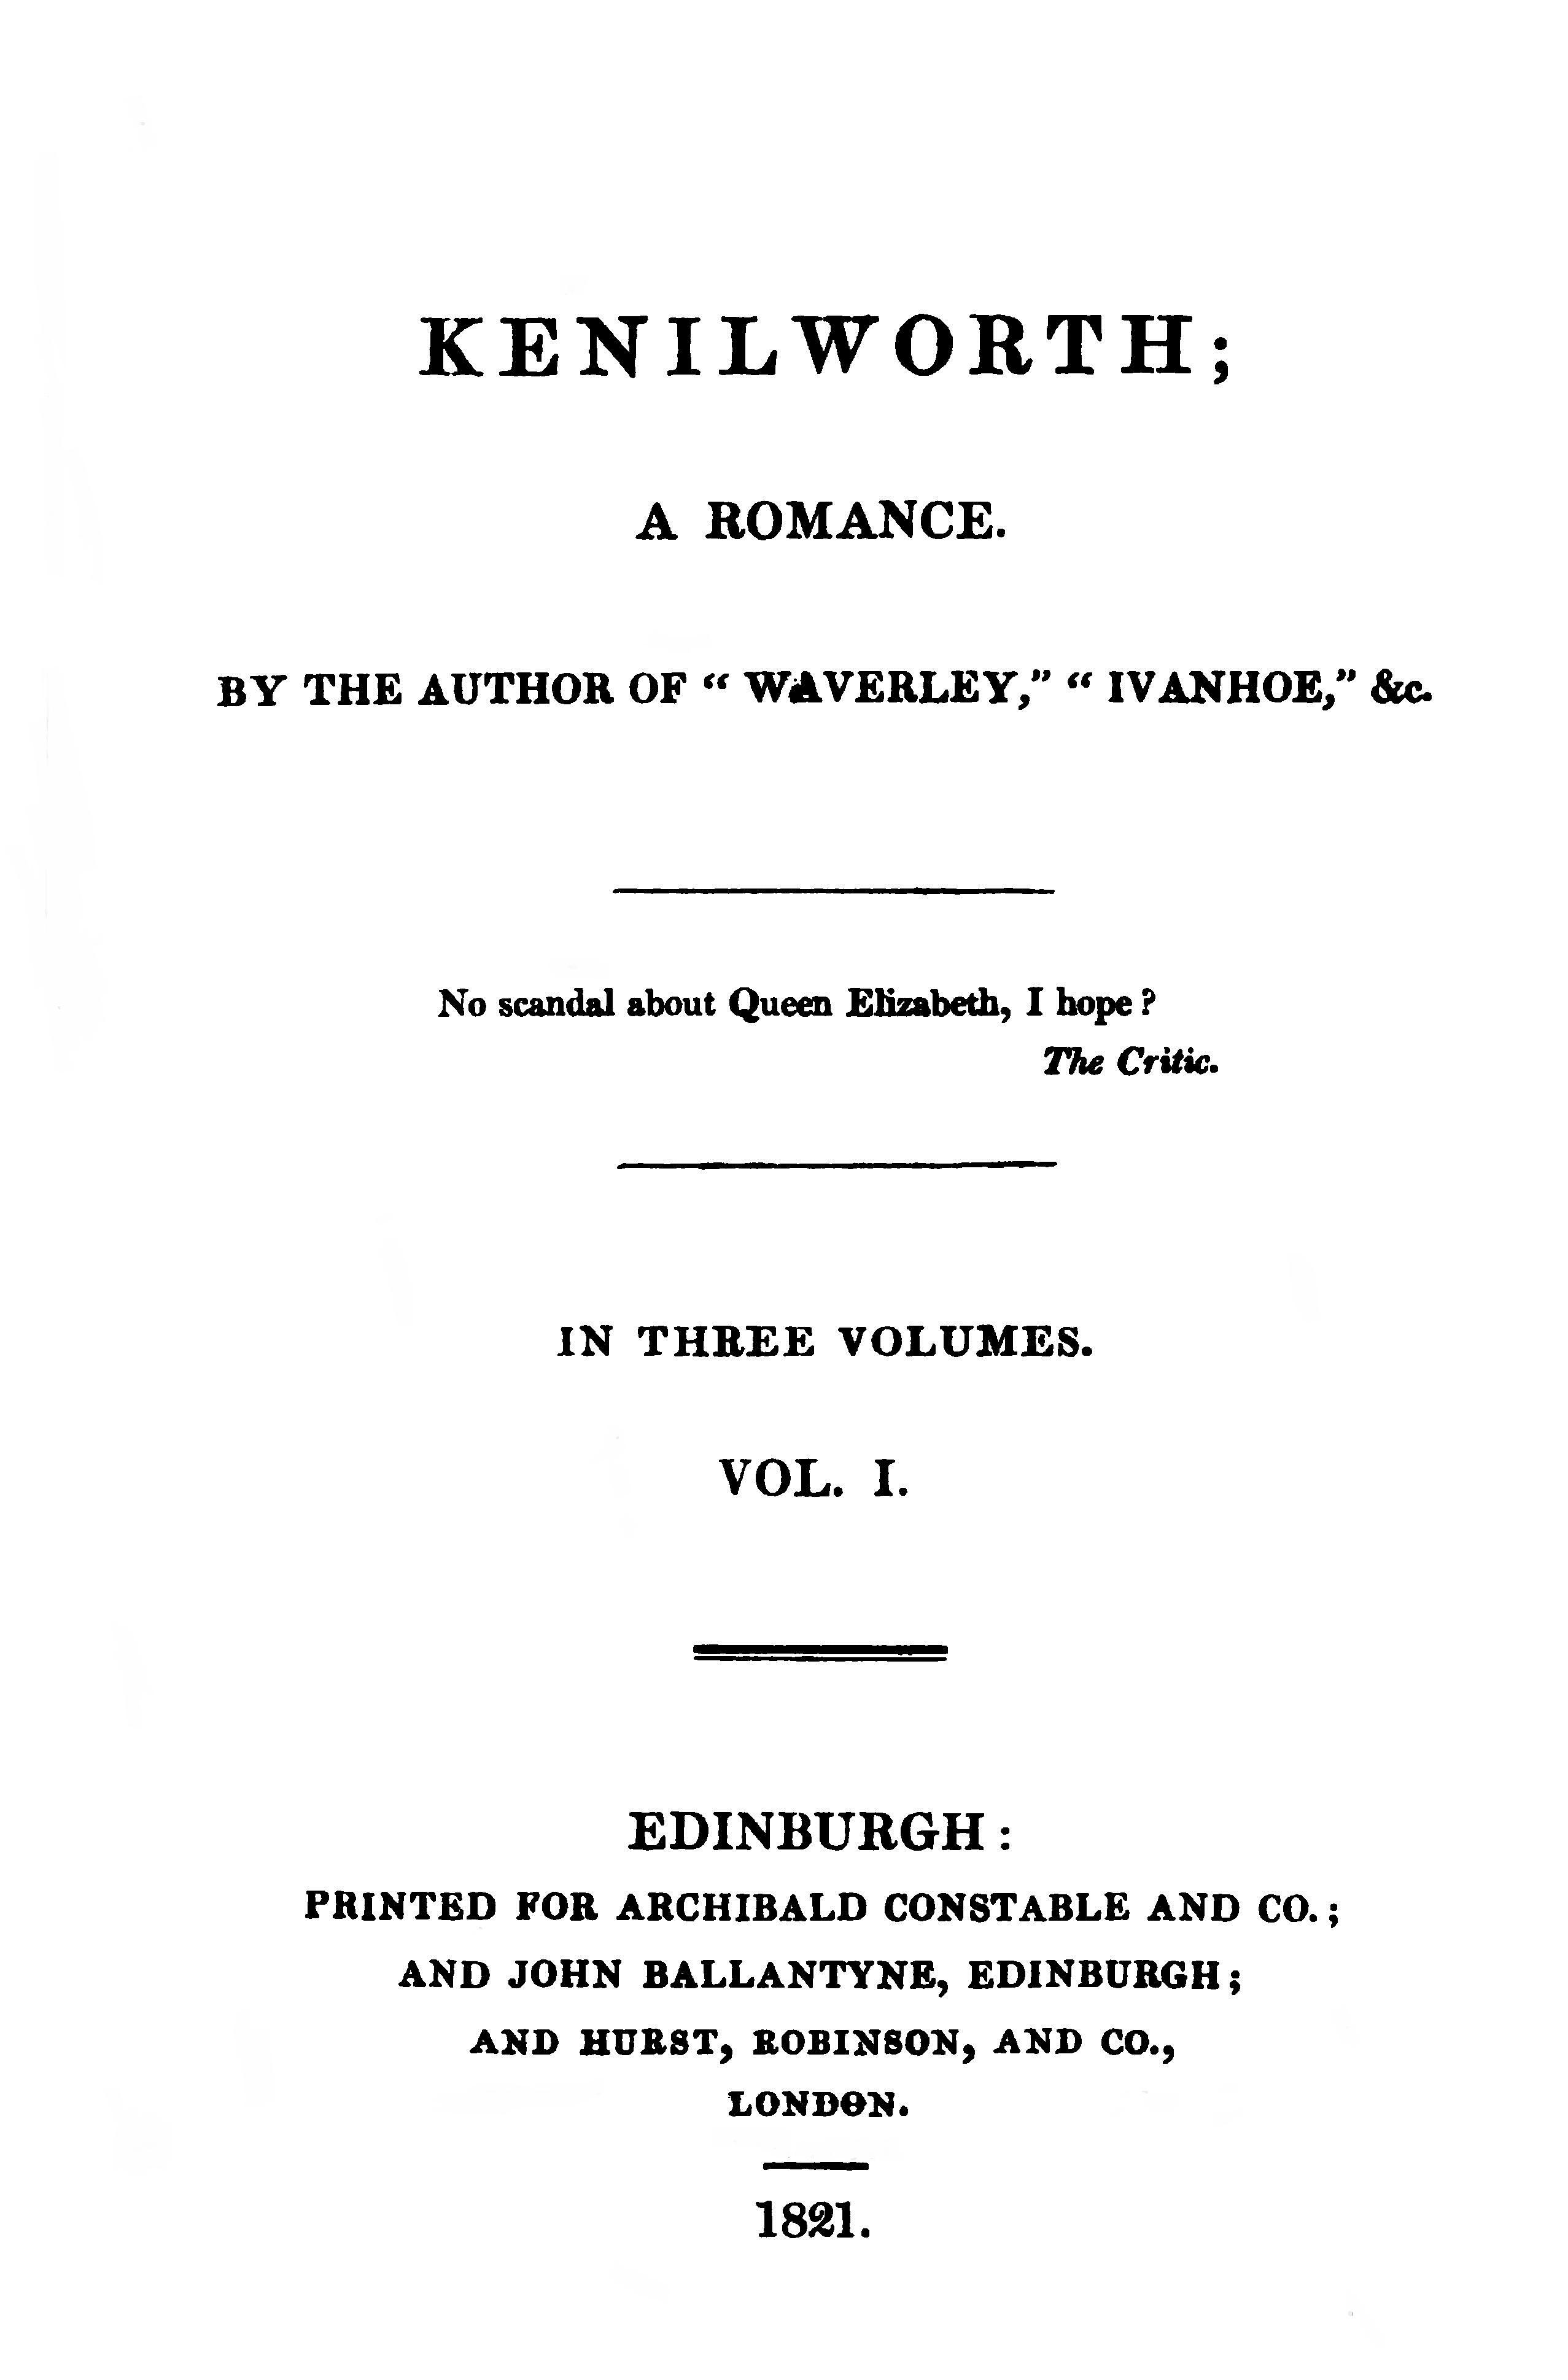 Kenilworth (novel) - Wikipedia